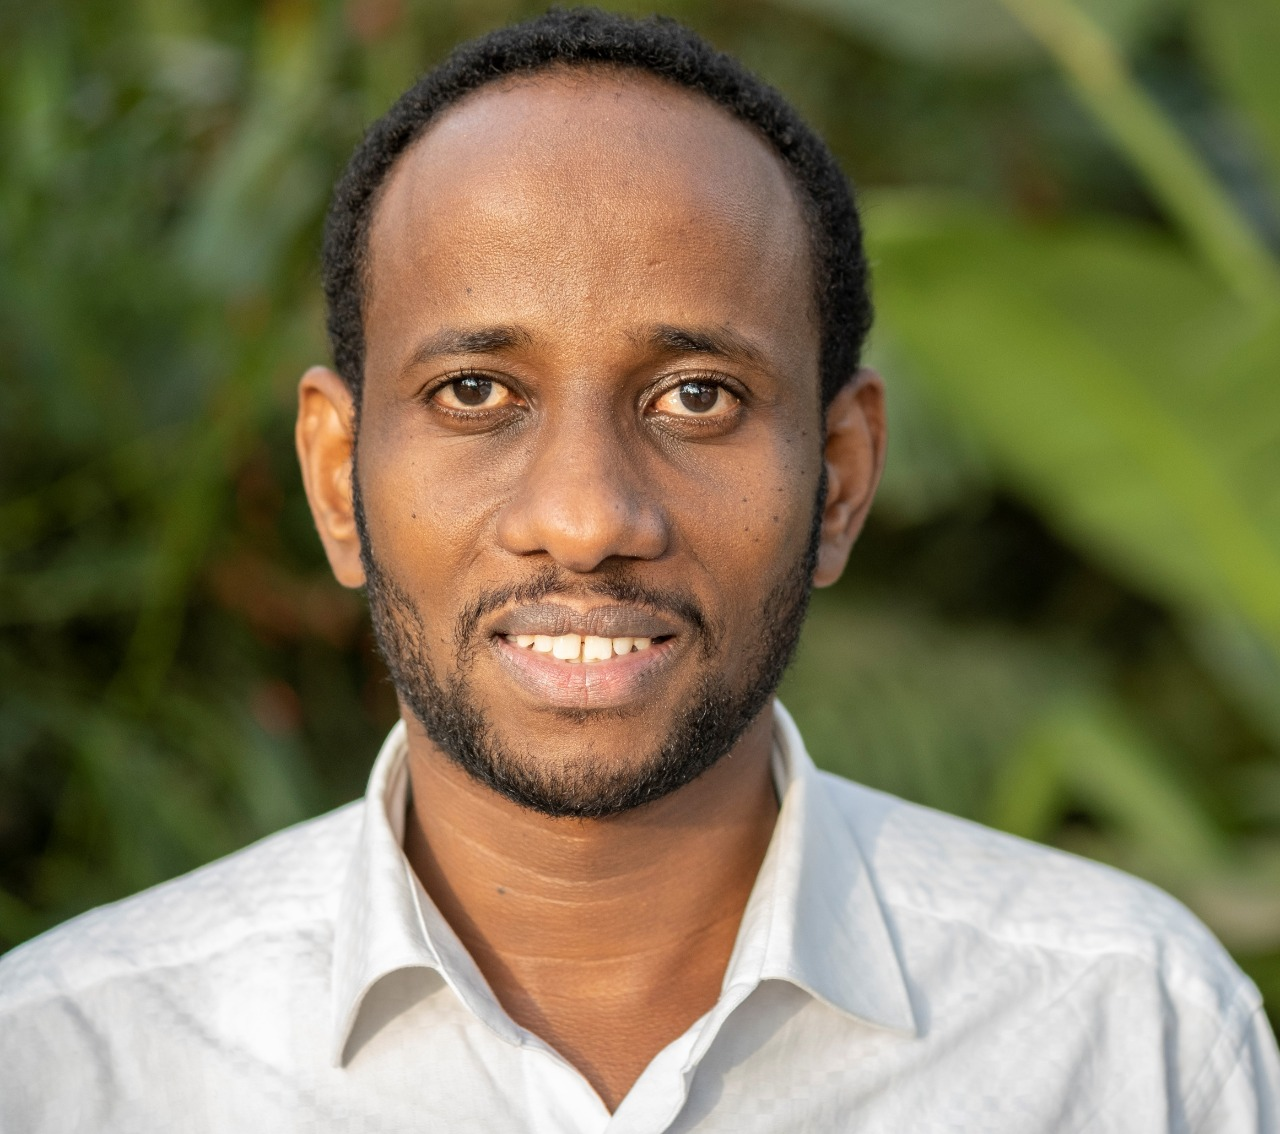 Profile picure of Ali Abdullahi